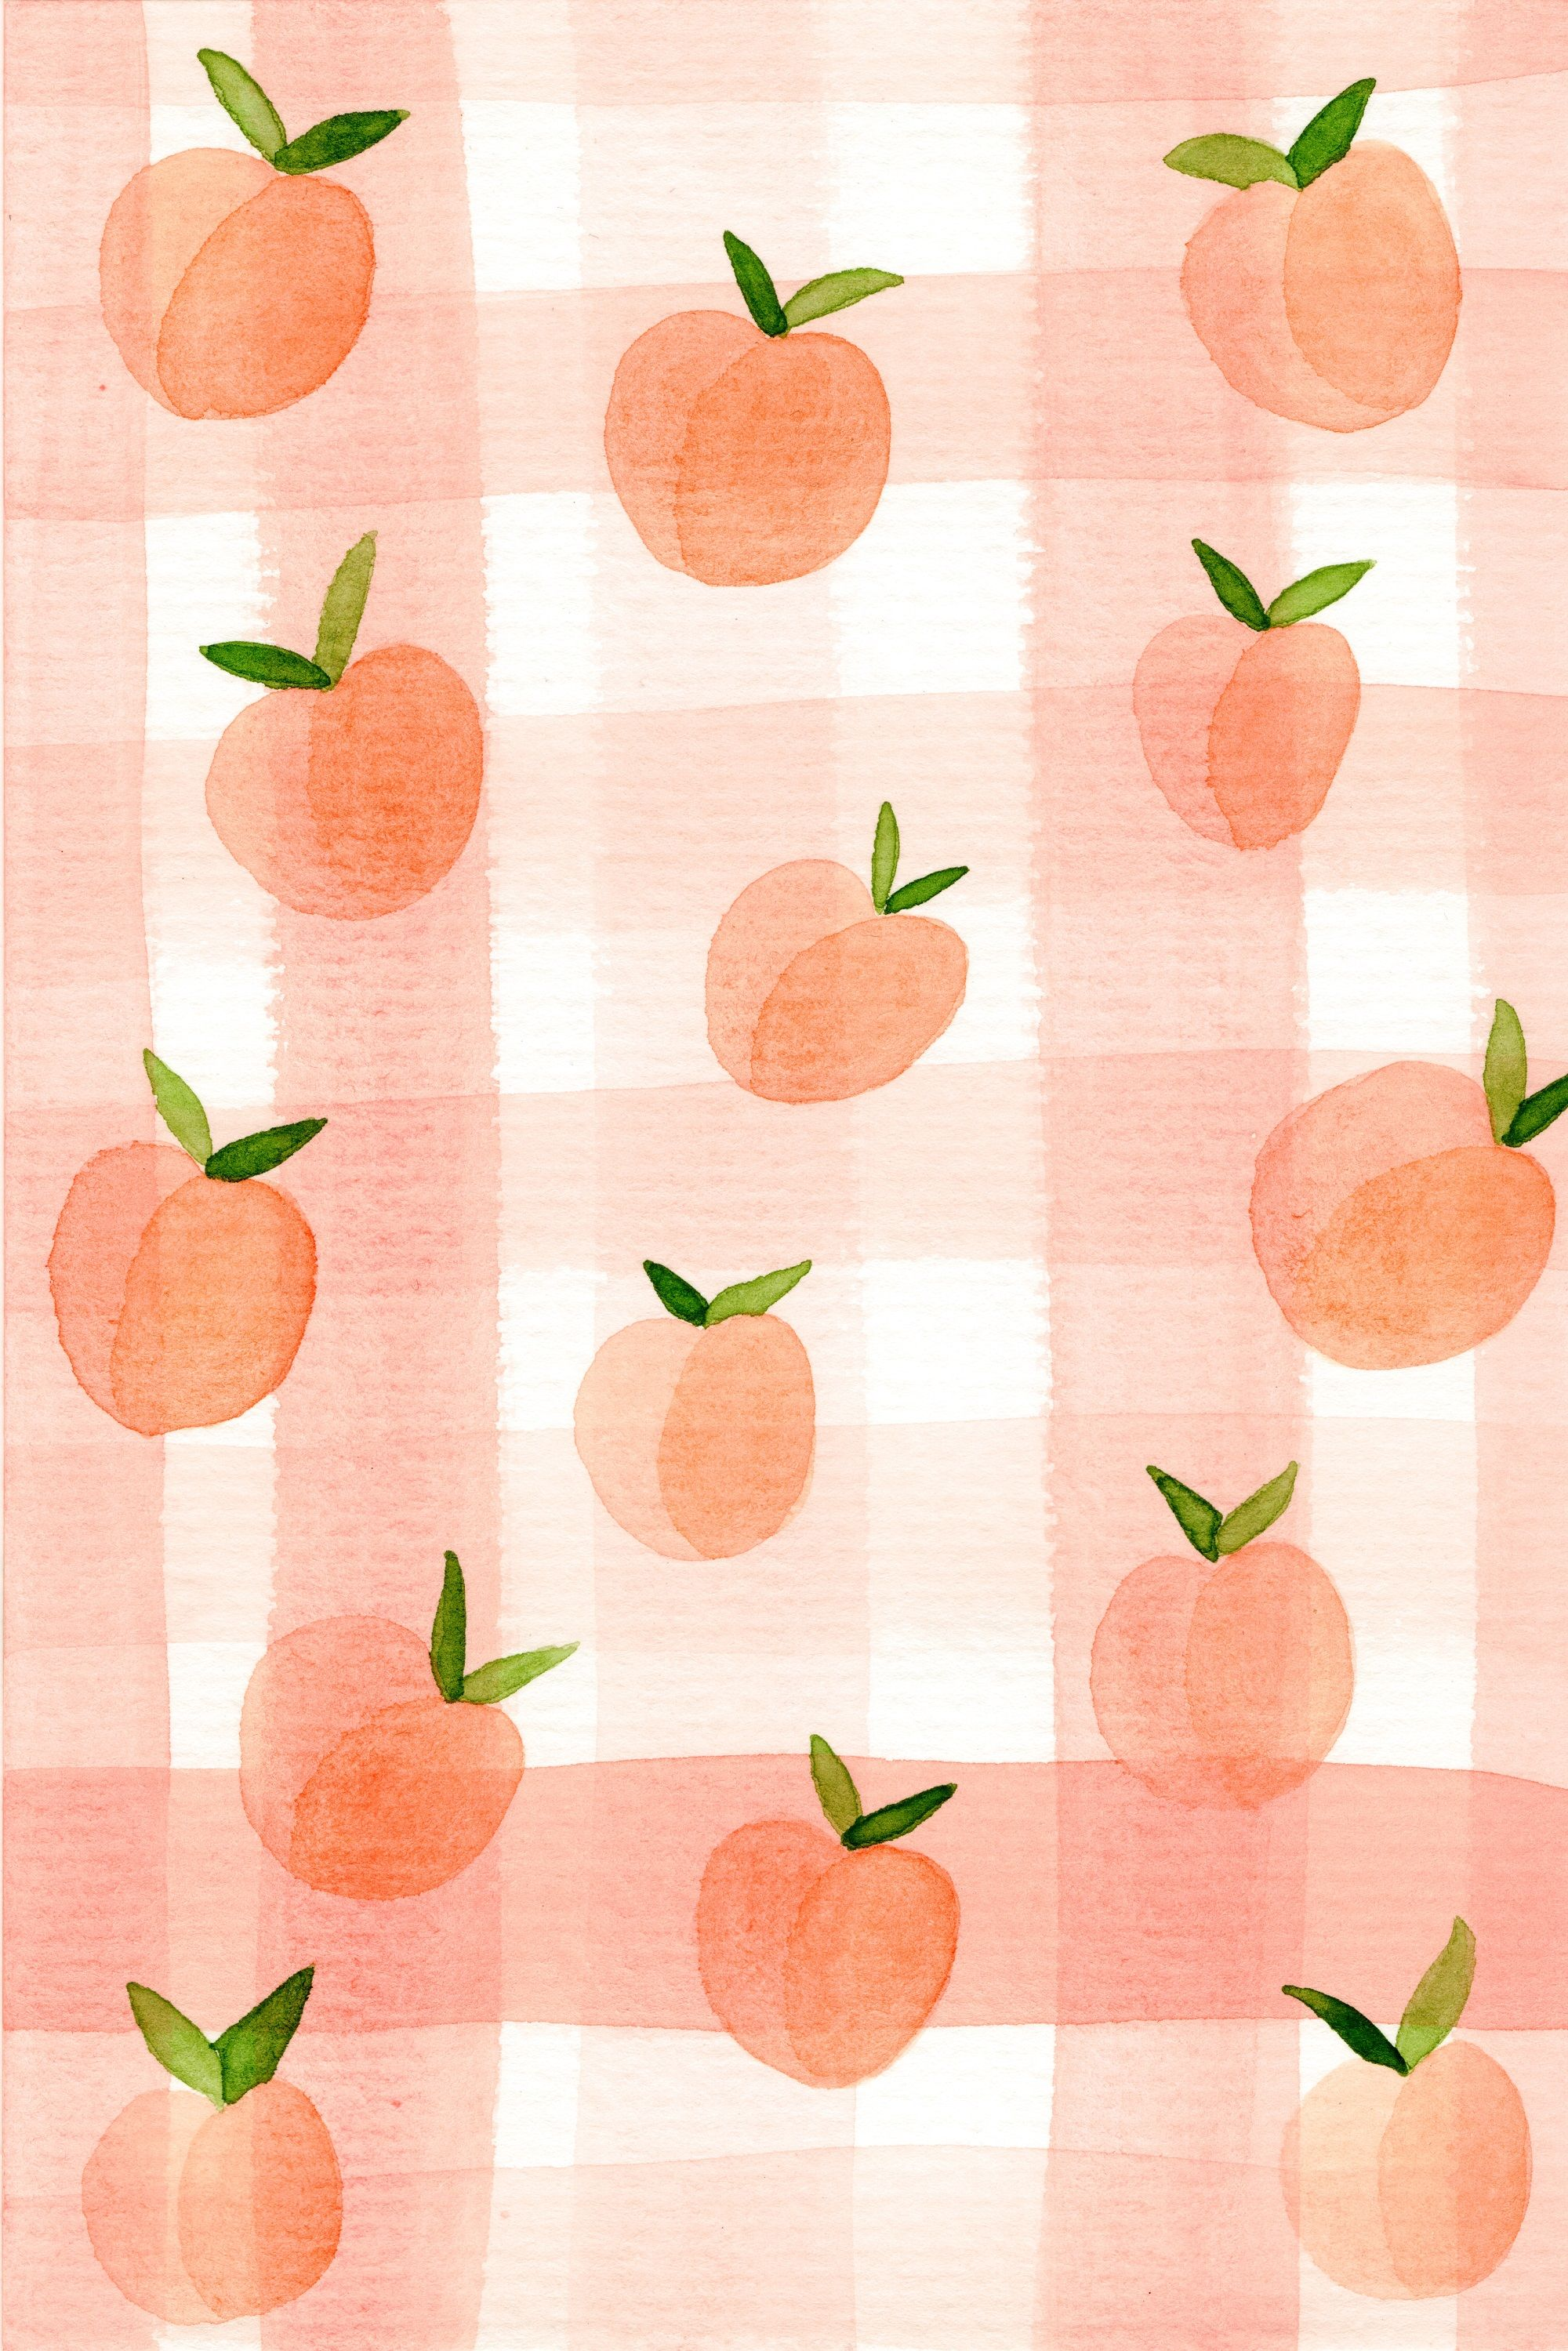 Peach Gingham Navy Leaf Co 2018 Pattern Design Designs Decor Peach Wallpaper Iphone Wallpaper Fruit Wallpaper